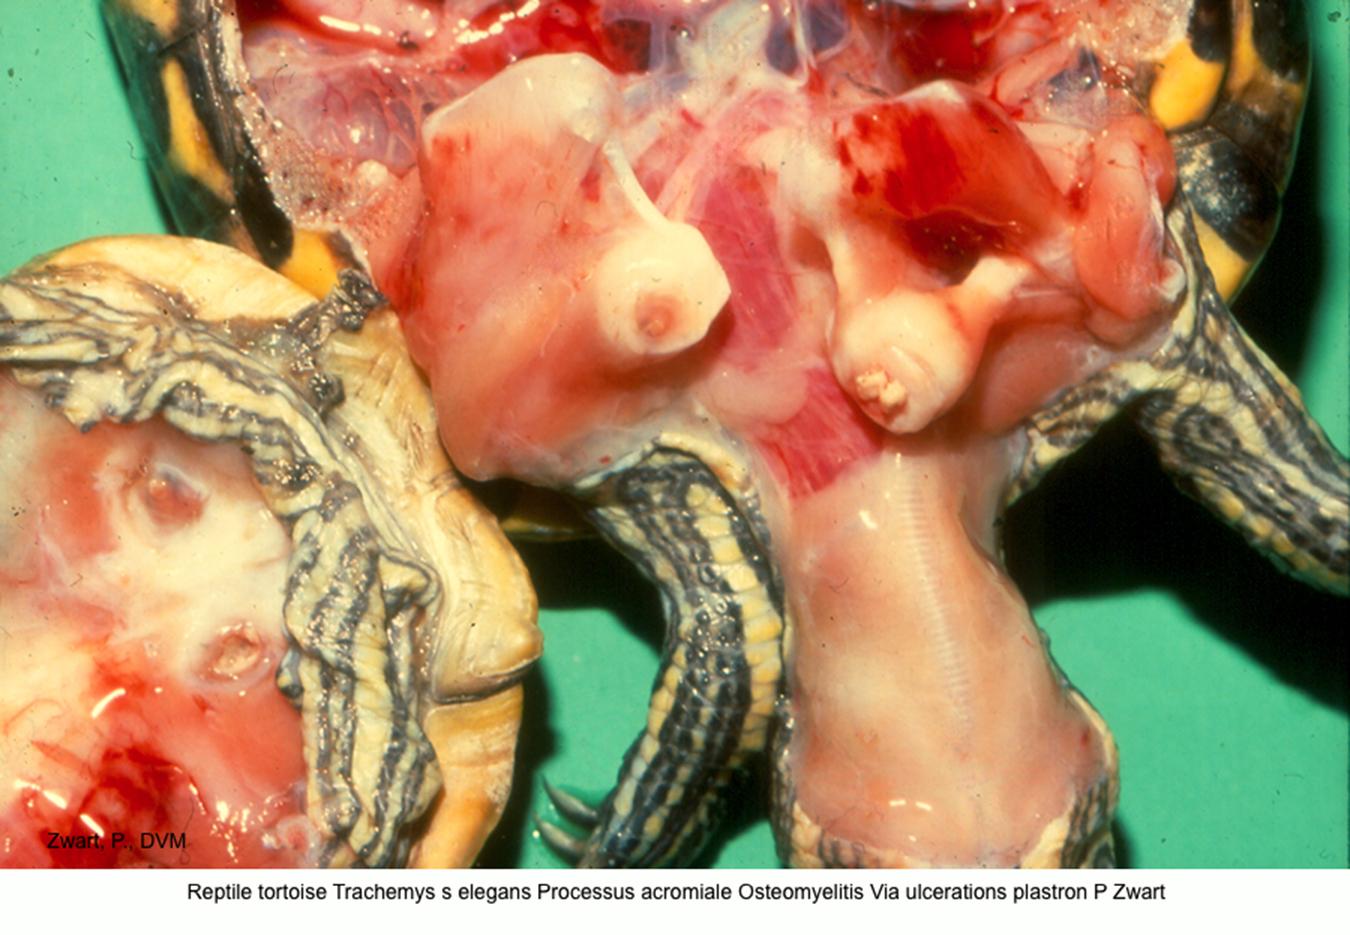 Trachemys s elegans Processus acromiale Osteomyelitis Via plastron ulcerations P Zwart kopie.jpg